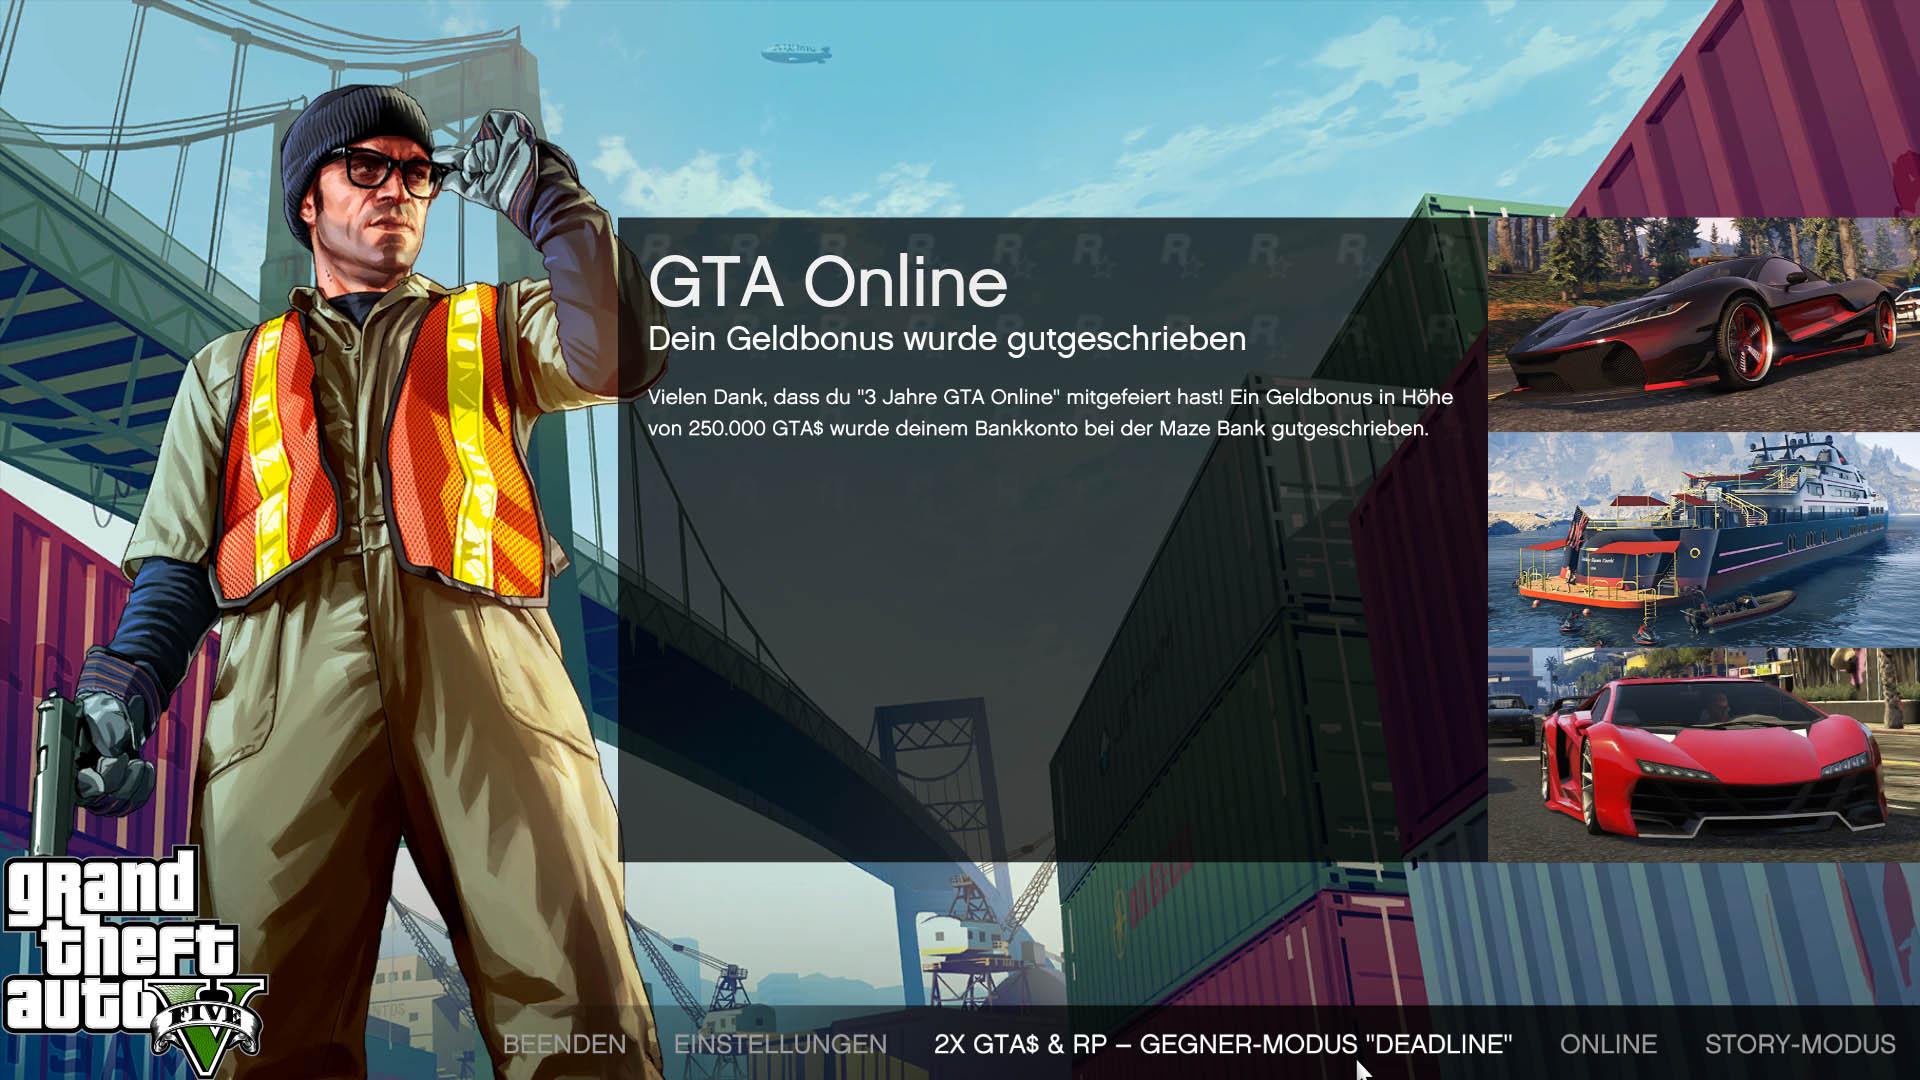 wie kann man bei gta 5 online spielen